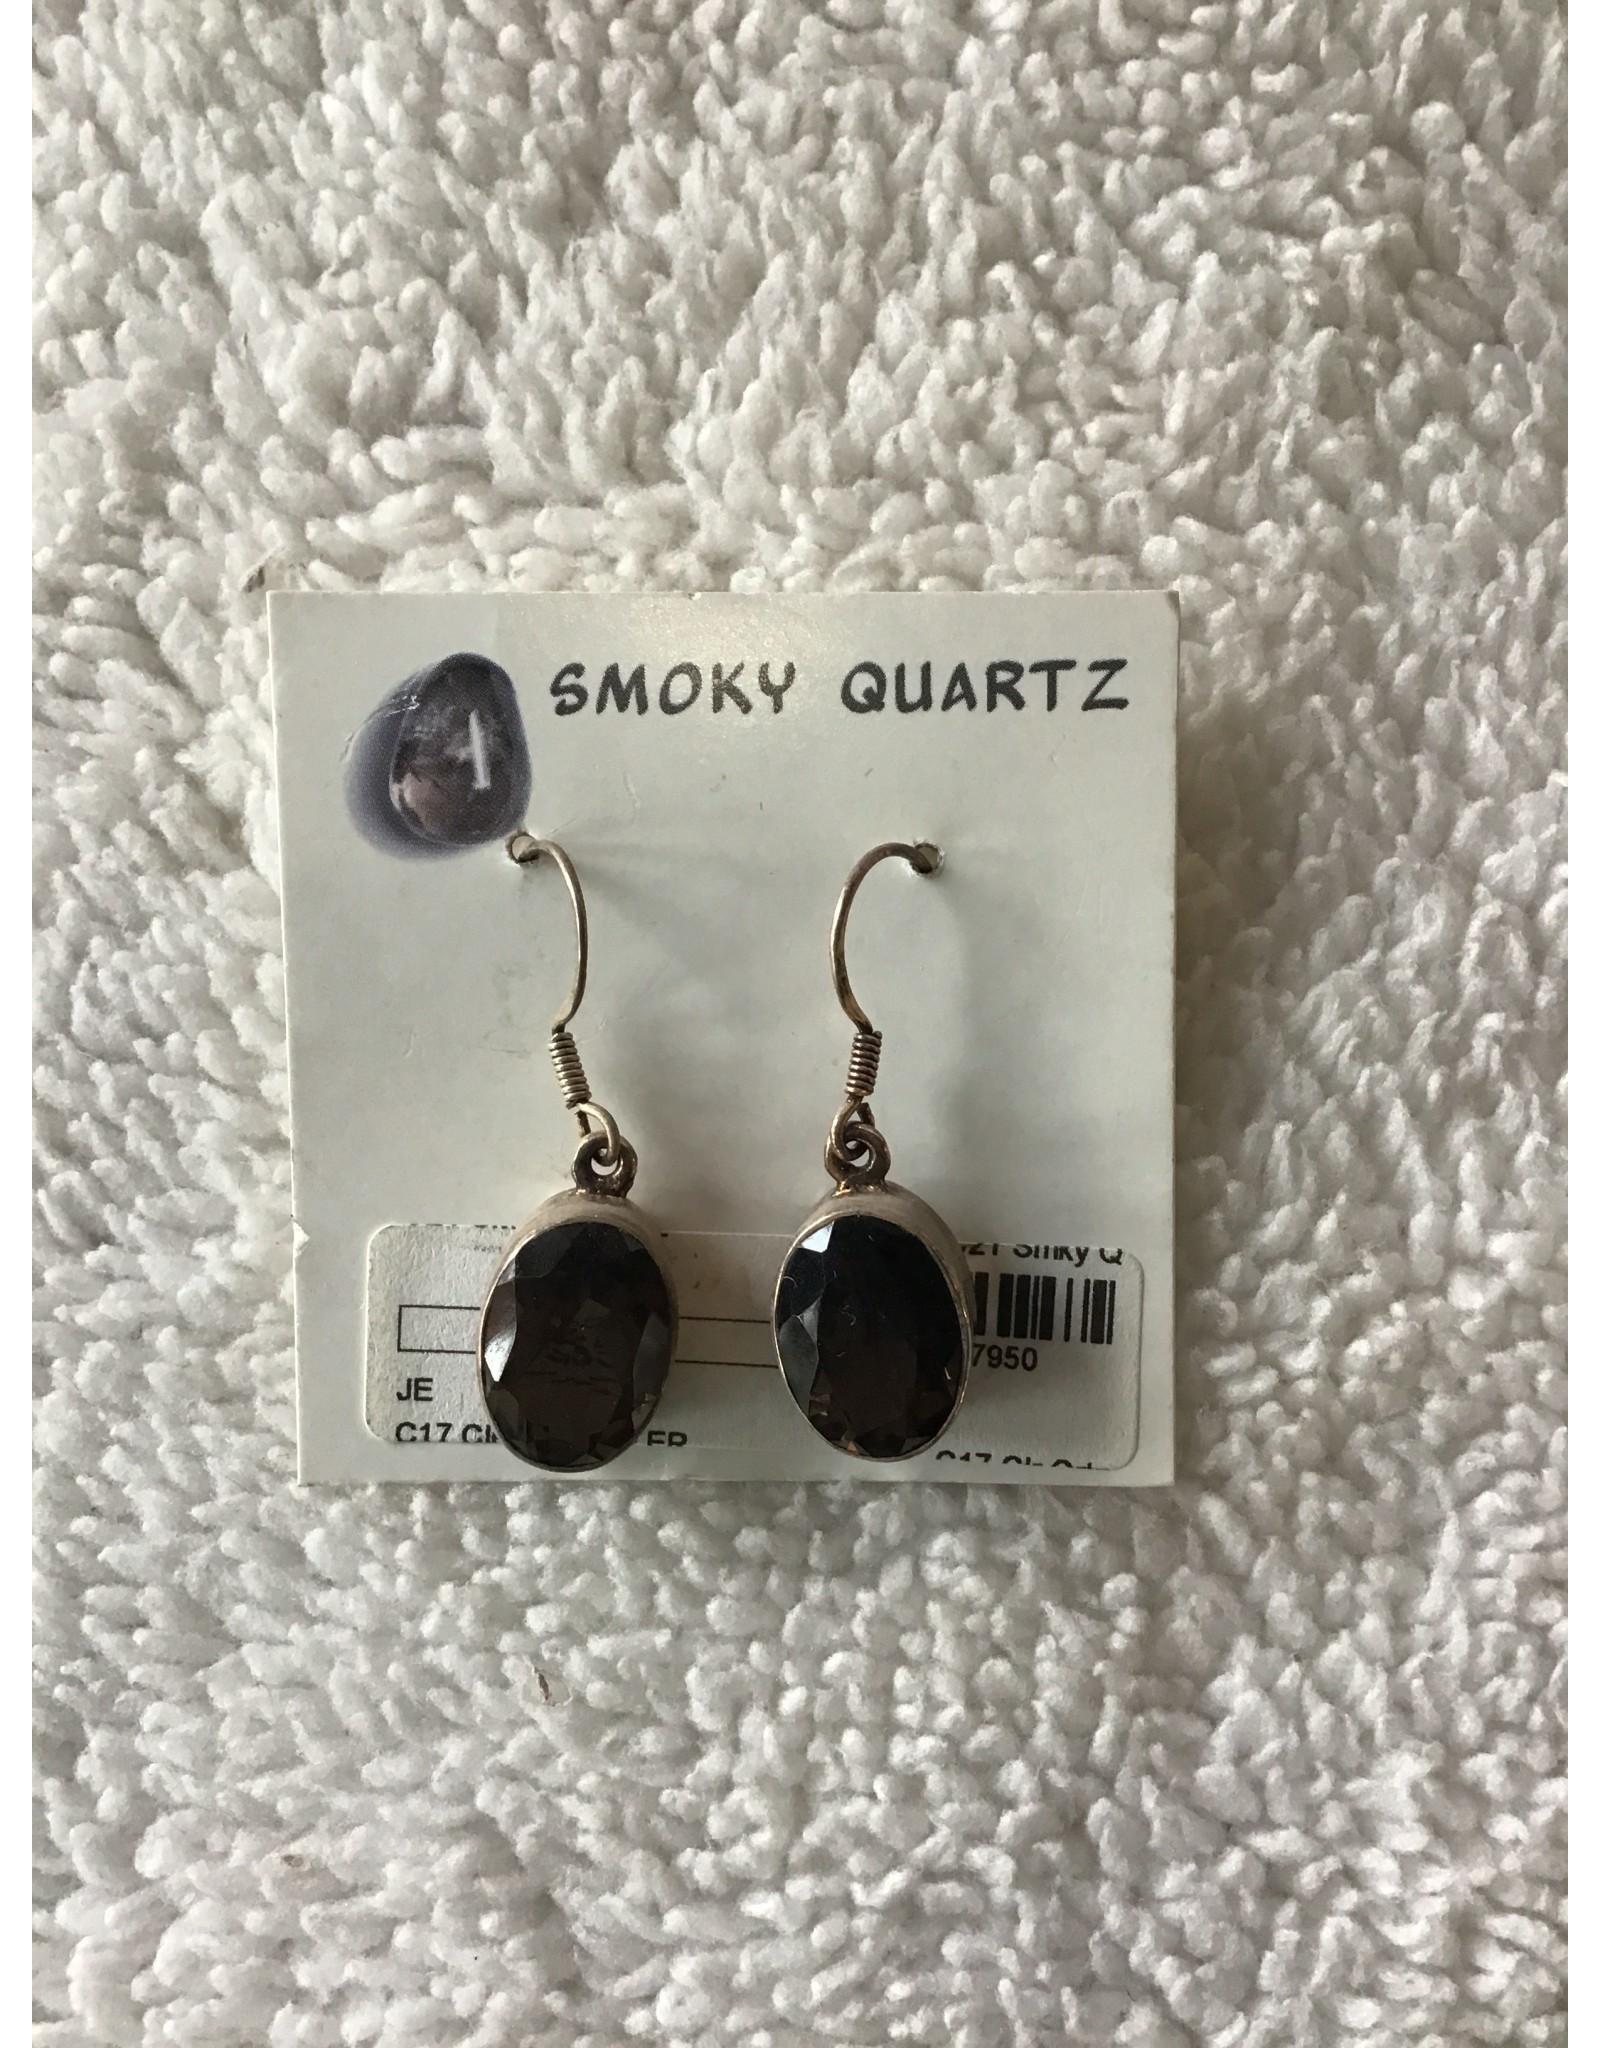 Smoky Quartz Oval Earrings